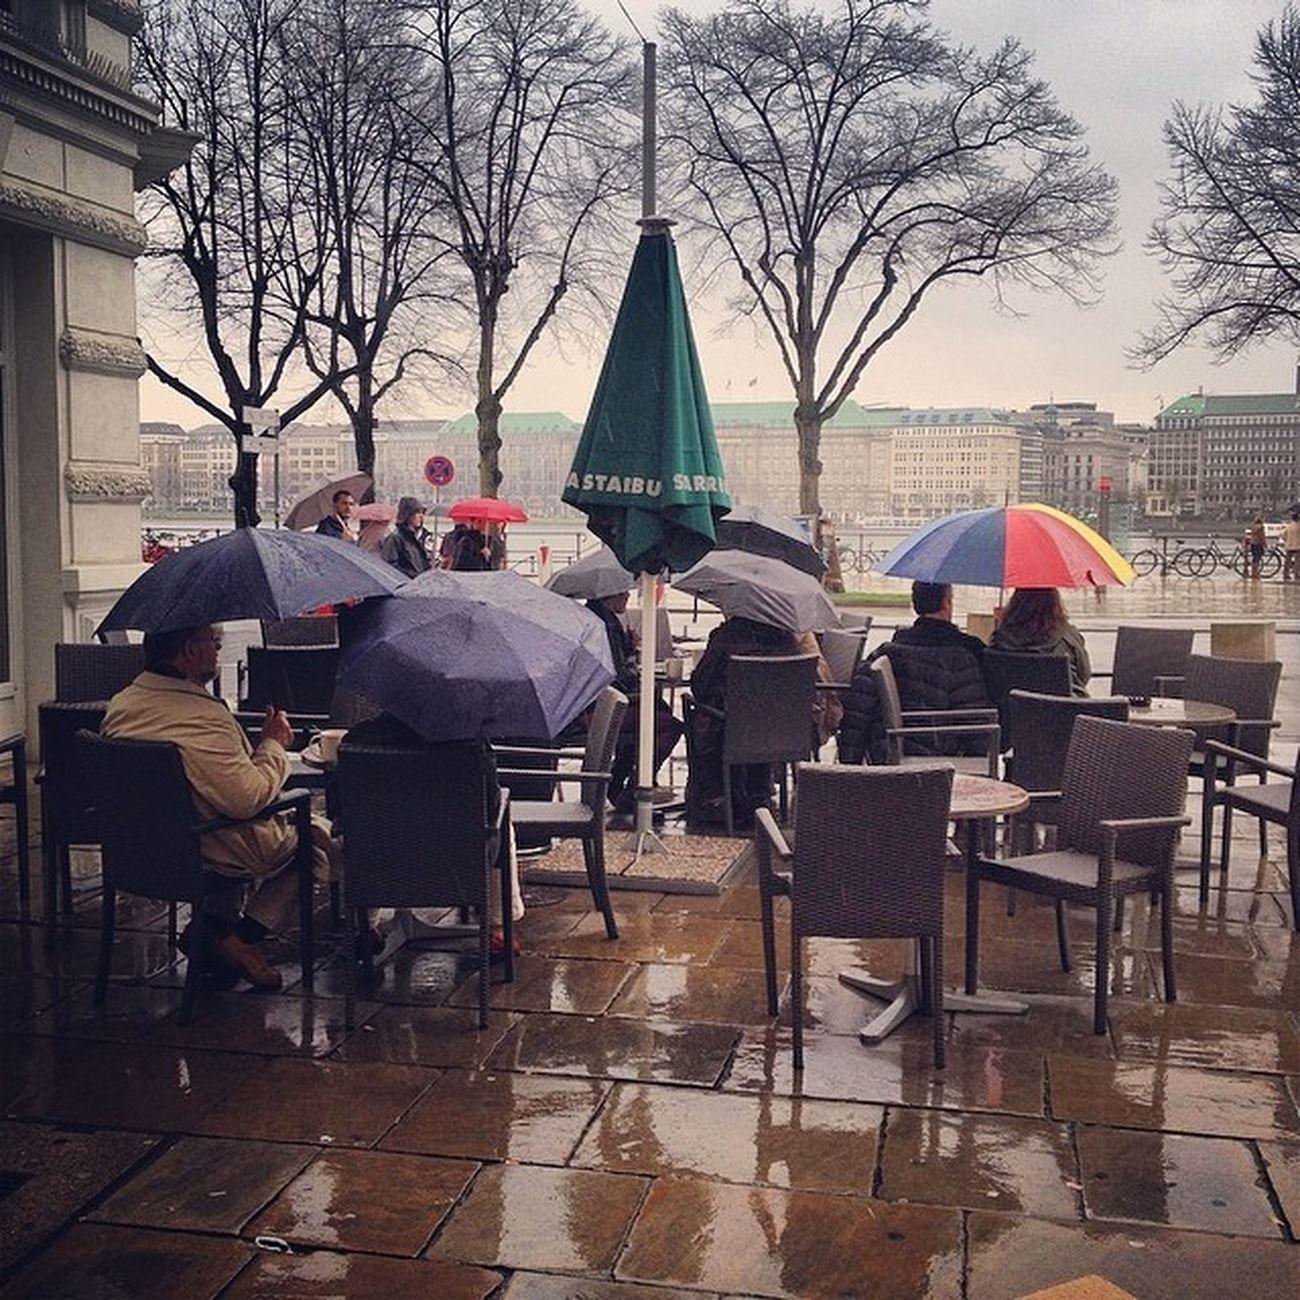 #coffee #cafe #instacoffee #cafelife #caffeine #hot #mug #drink #coffeeaddict #coffeegram #coffeeoftheday #cotd #coffeelover #coffeelovers #coffeeholic #coffiecup #coffeelove #coffeemug #coffeeholic #coffeelife #rain #hamburg #weather Instacoffee Coffeemug Coffeelovers Coffee Coffeelover Coffeelove Weather Cafelife Rain Cotd Drink Coffeeoftheday Cafe Coffeelife Coffeegram Mug Coffiecup Hot Caffeine Hamburg Coffeeholic Coffeeaddict